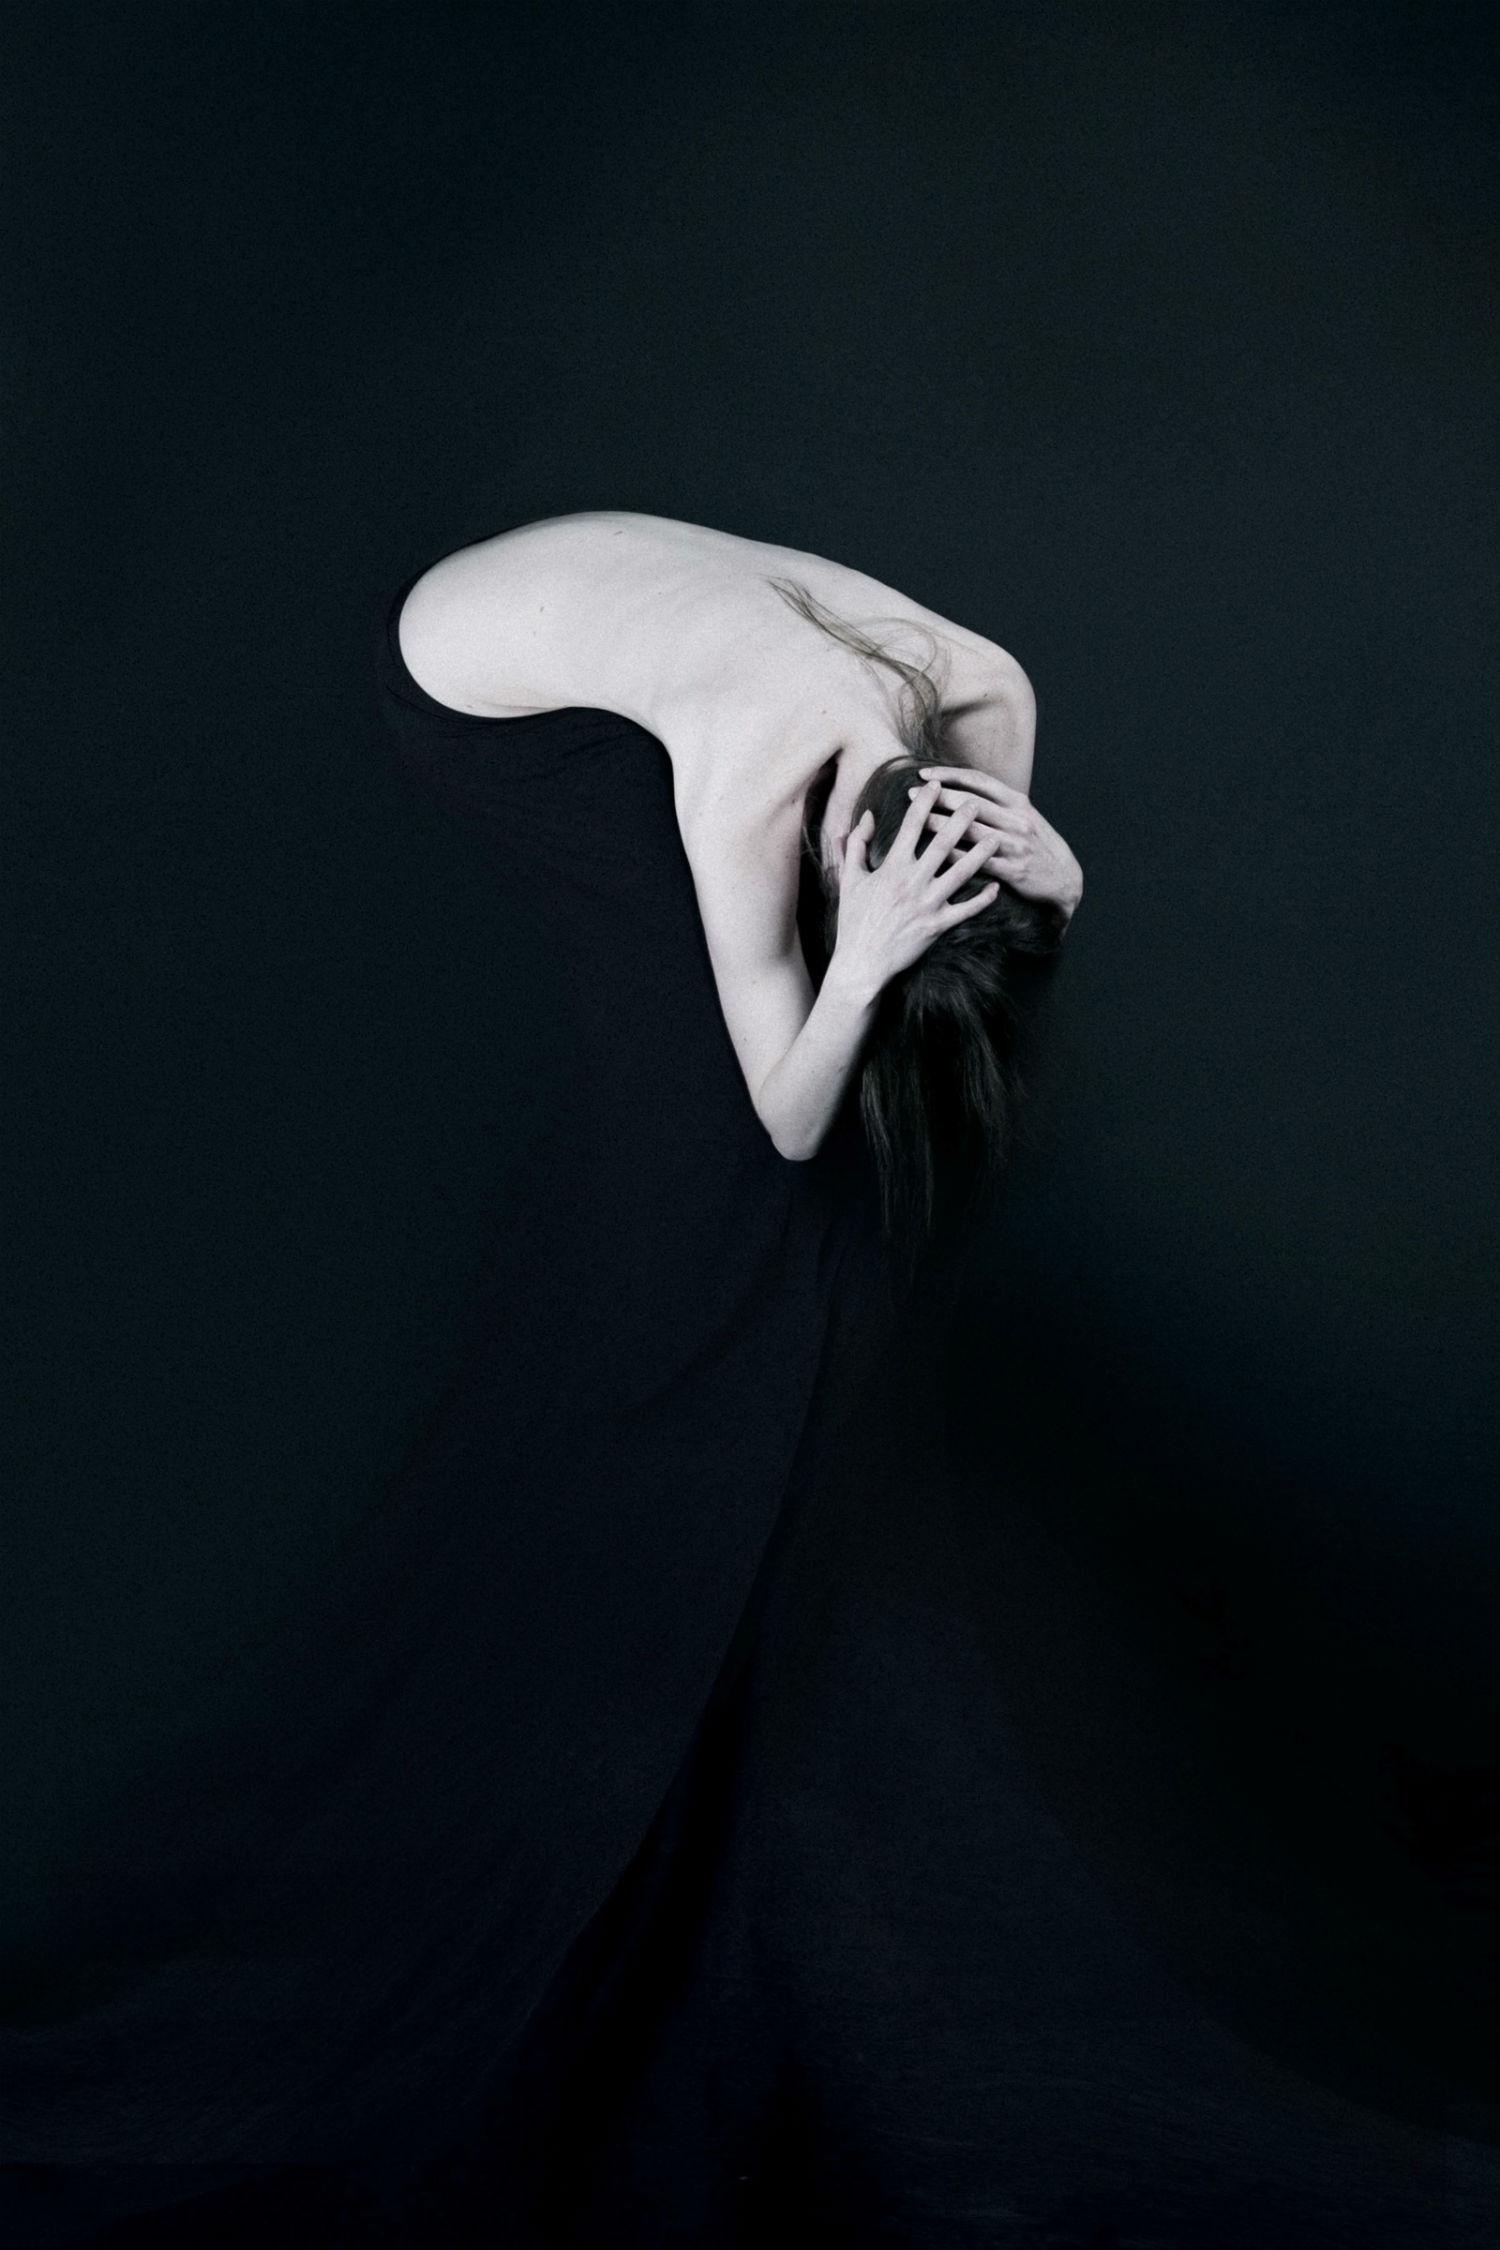 thibault delhom photography portraits